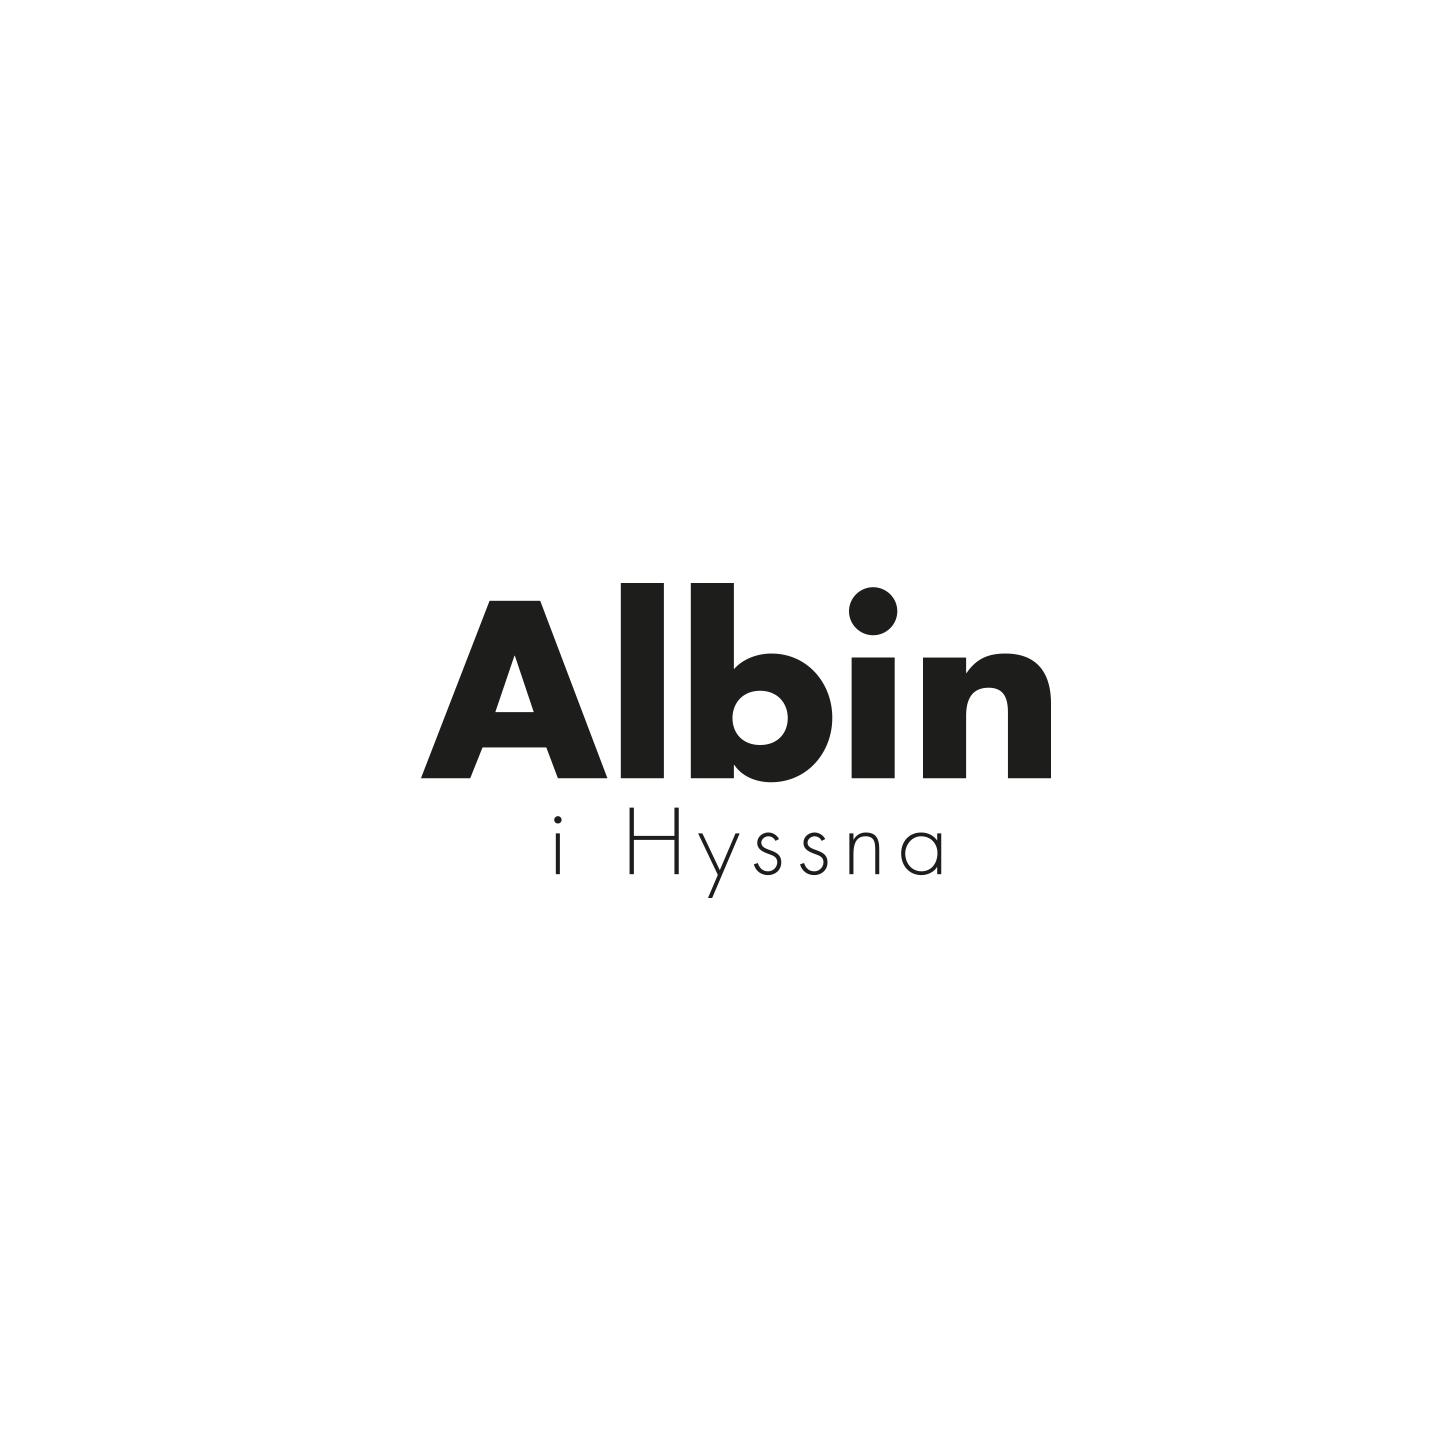 Albin i Hyssna